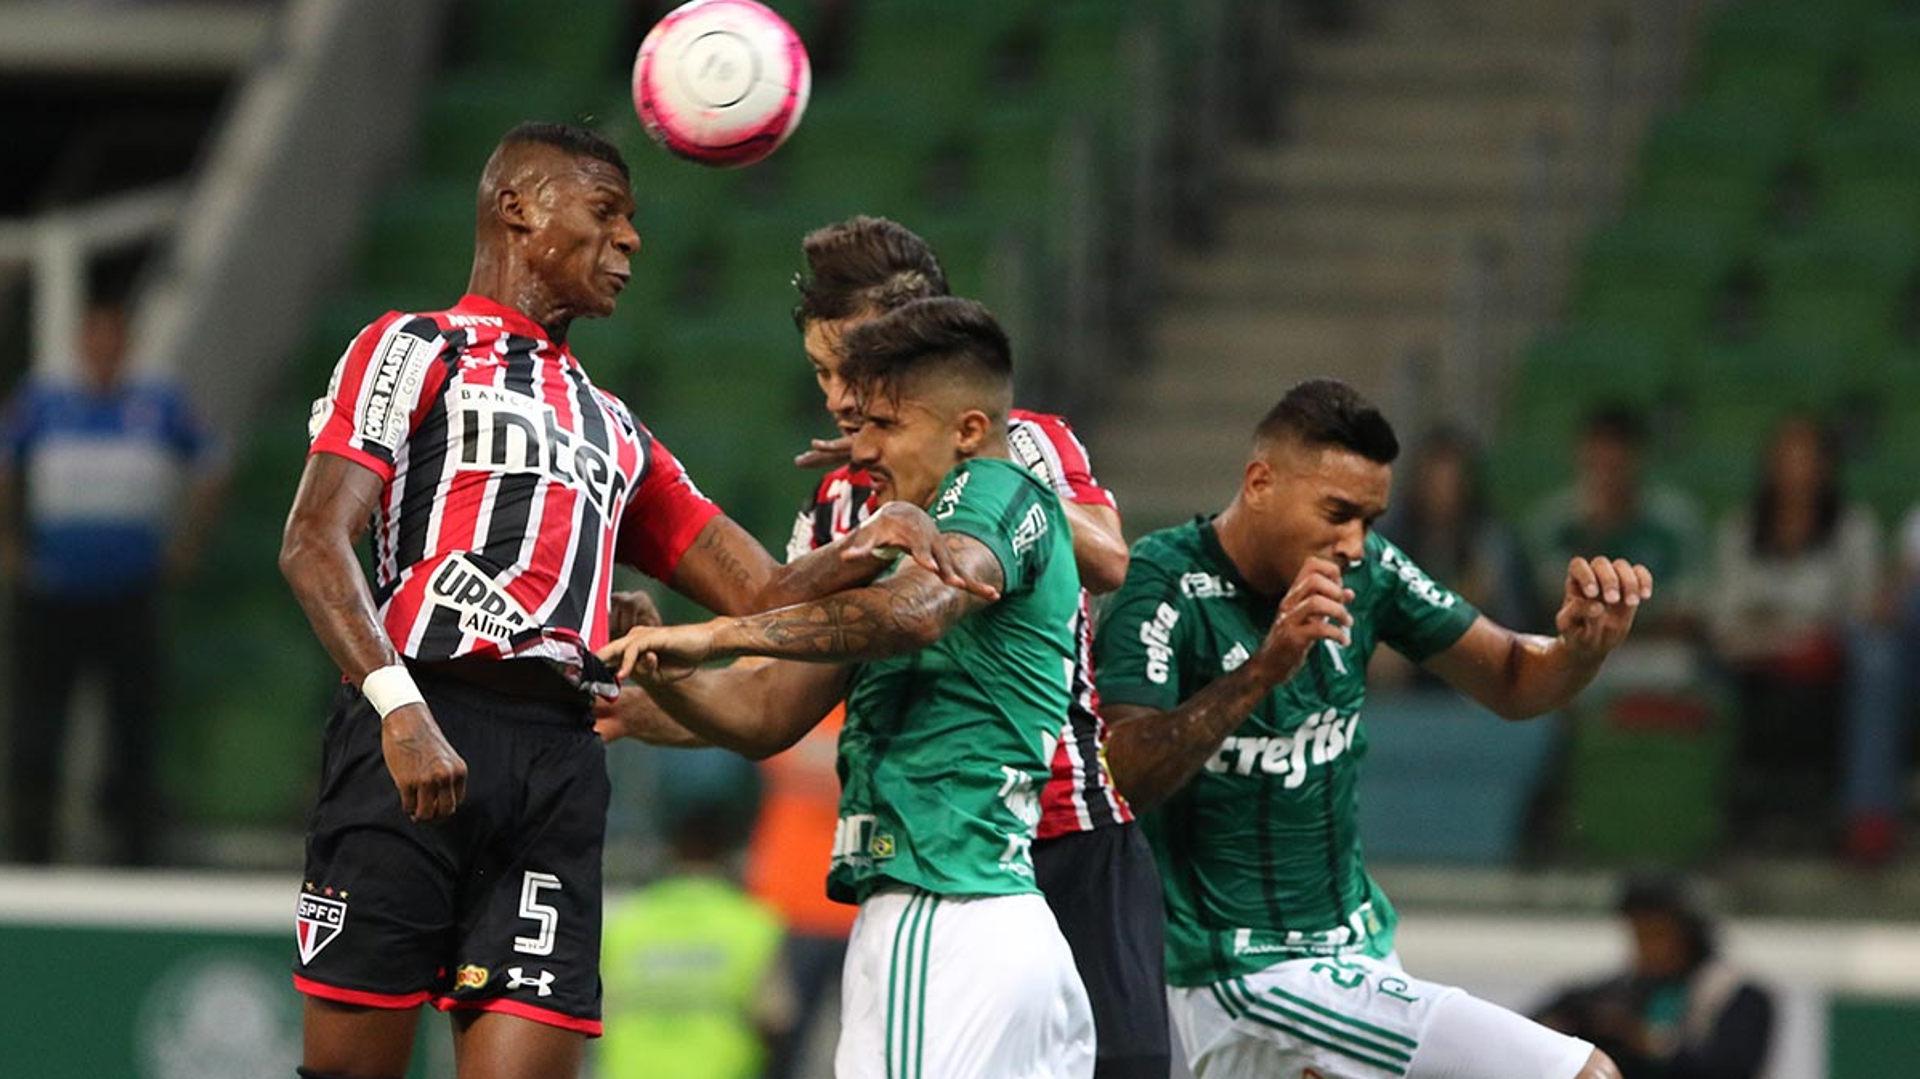 Arboleda Thiago Martins Antonio Carlos Palmeiras São Paulo 08032018 Paulista